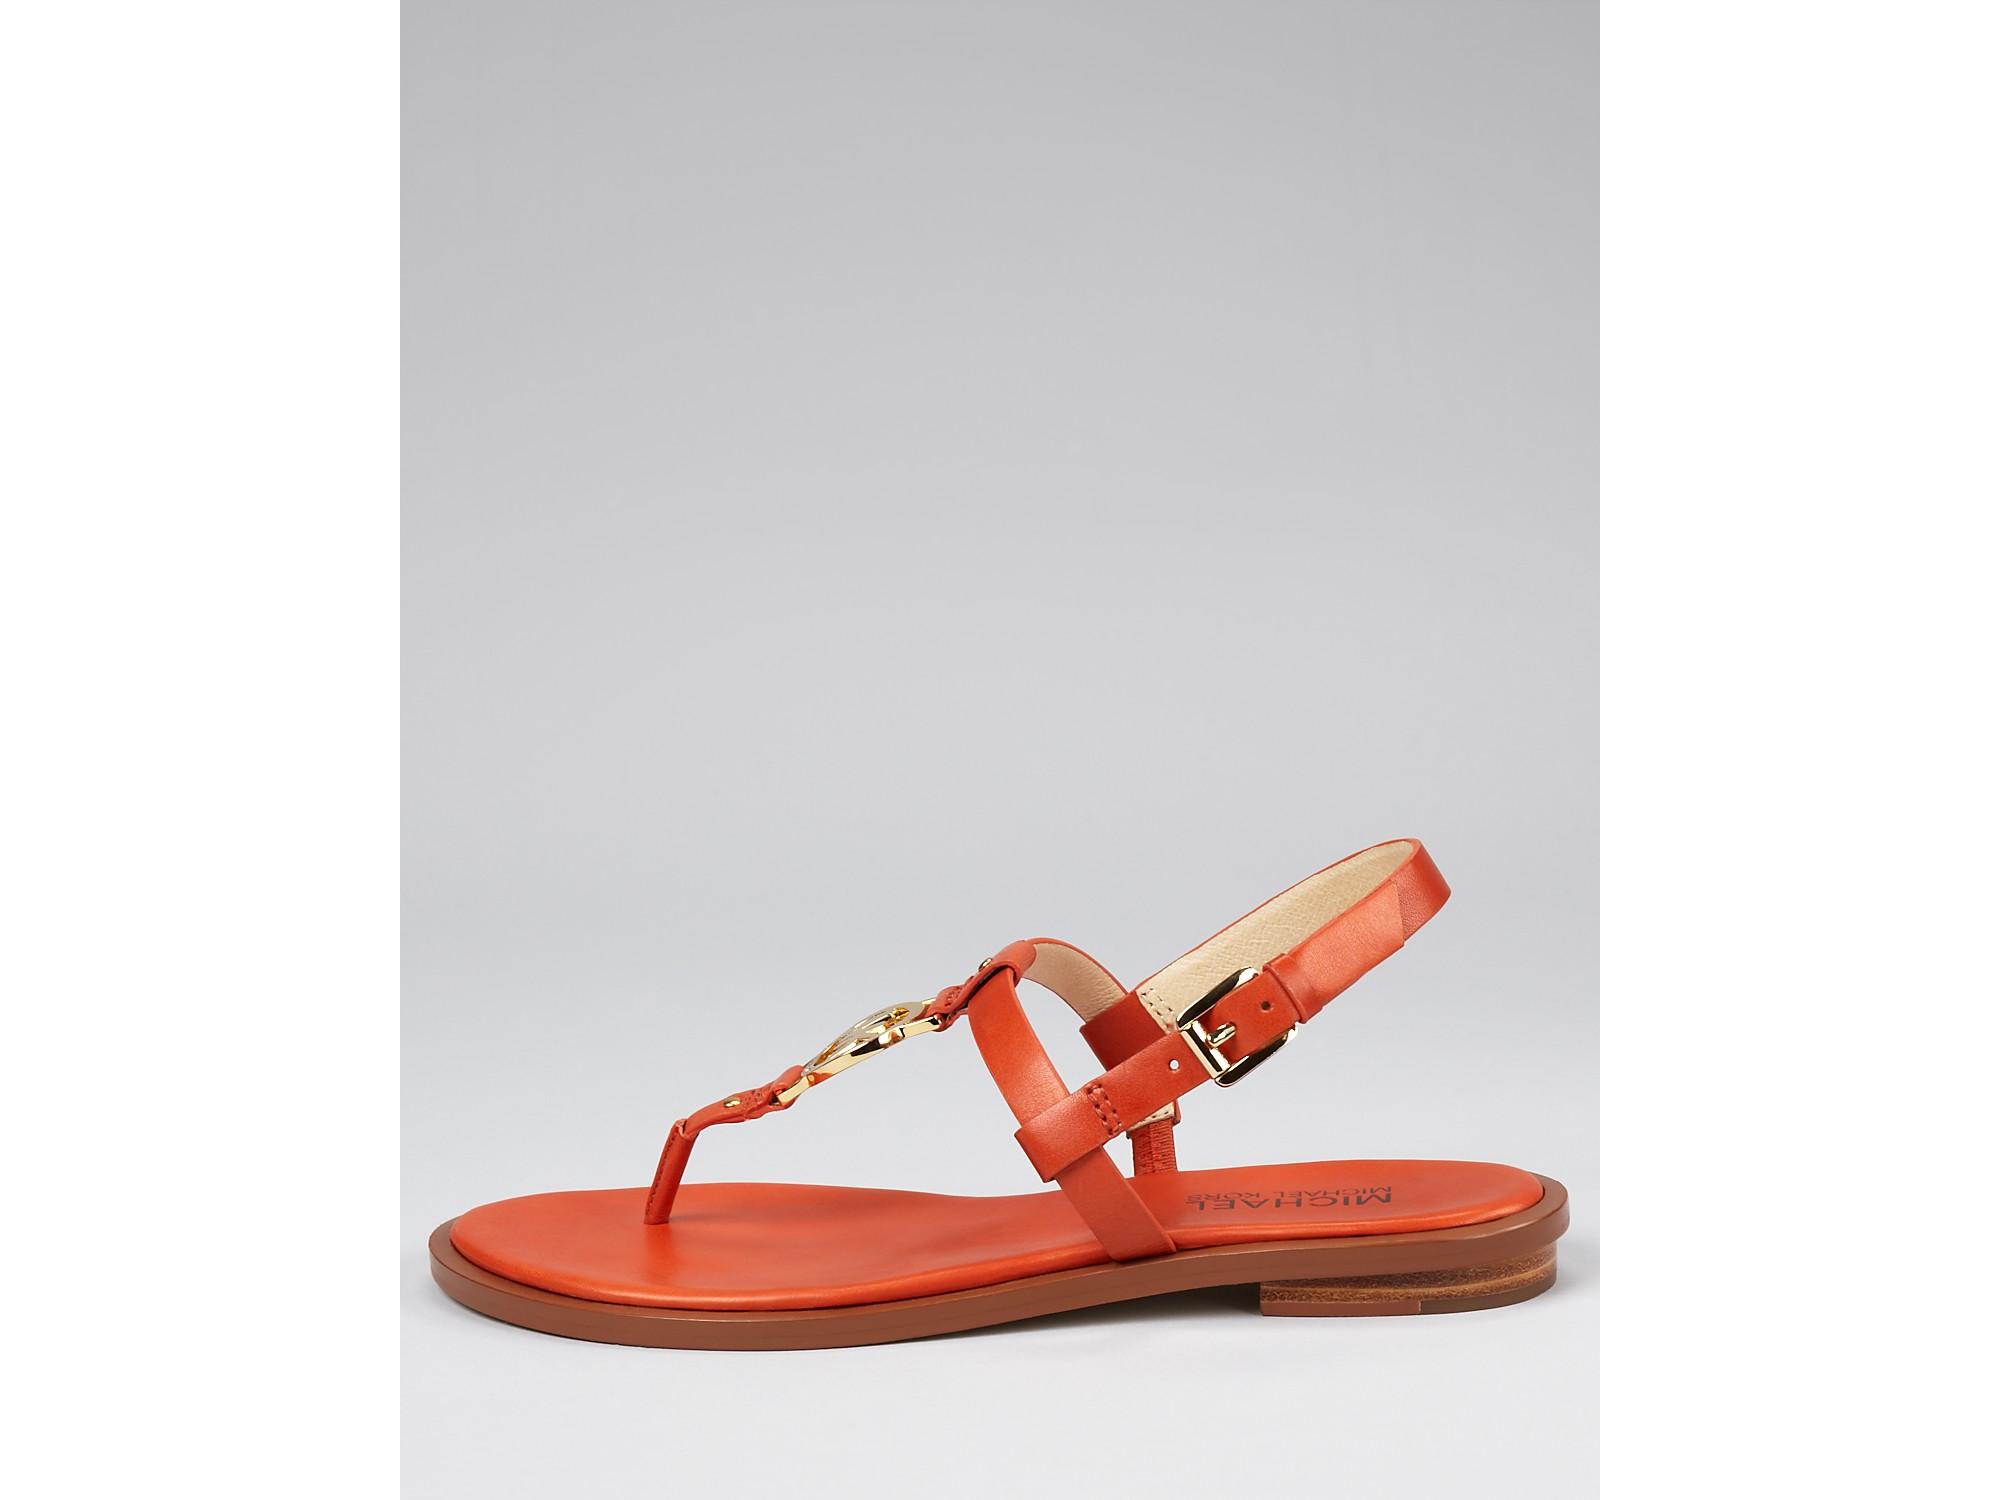 Michael Kors Sondra Flat Sandals in